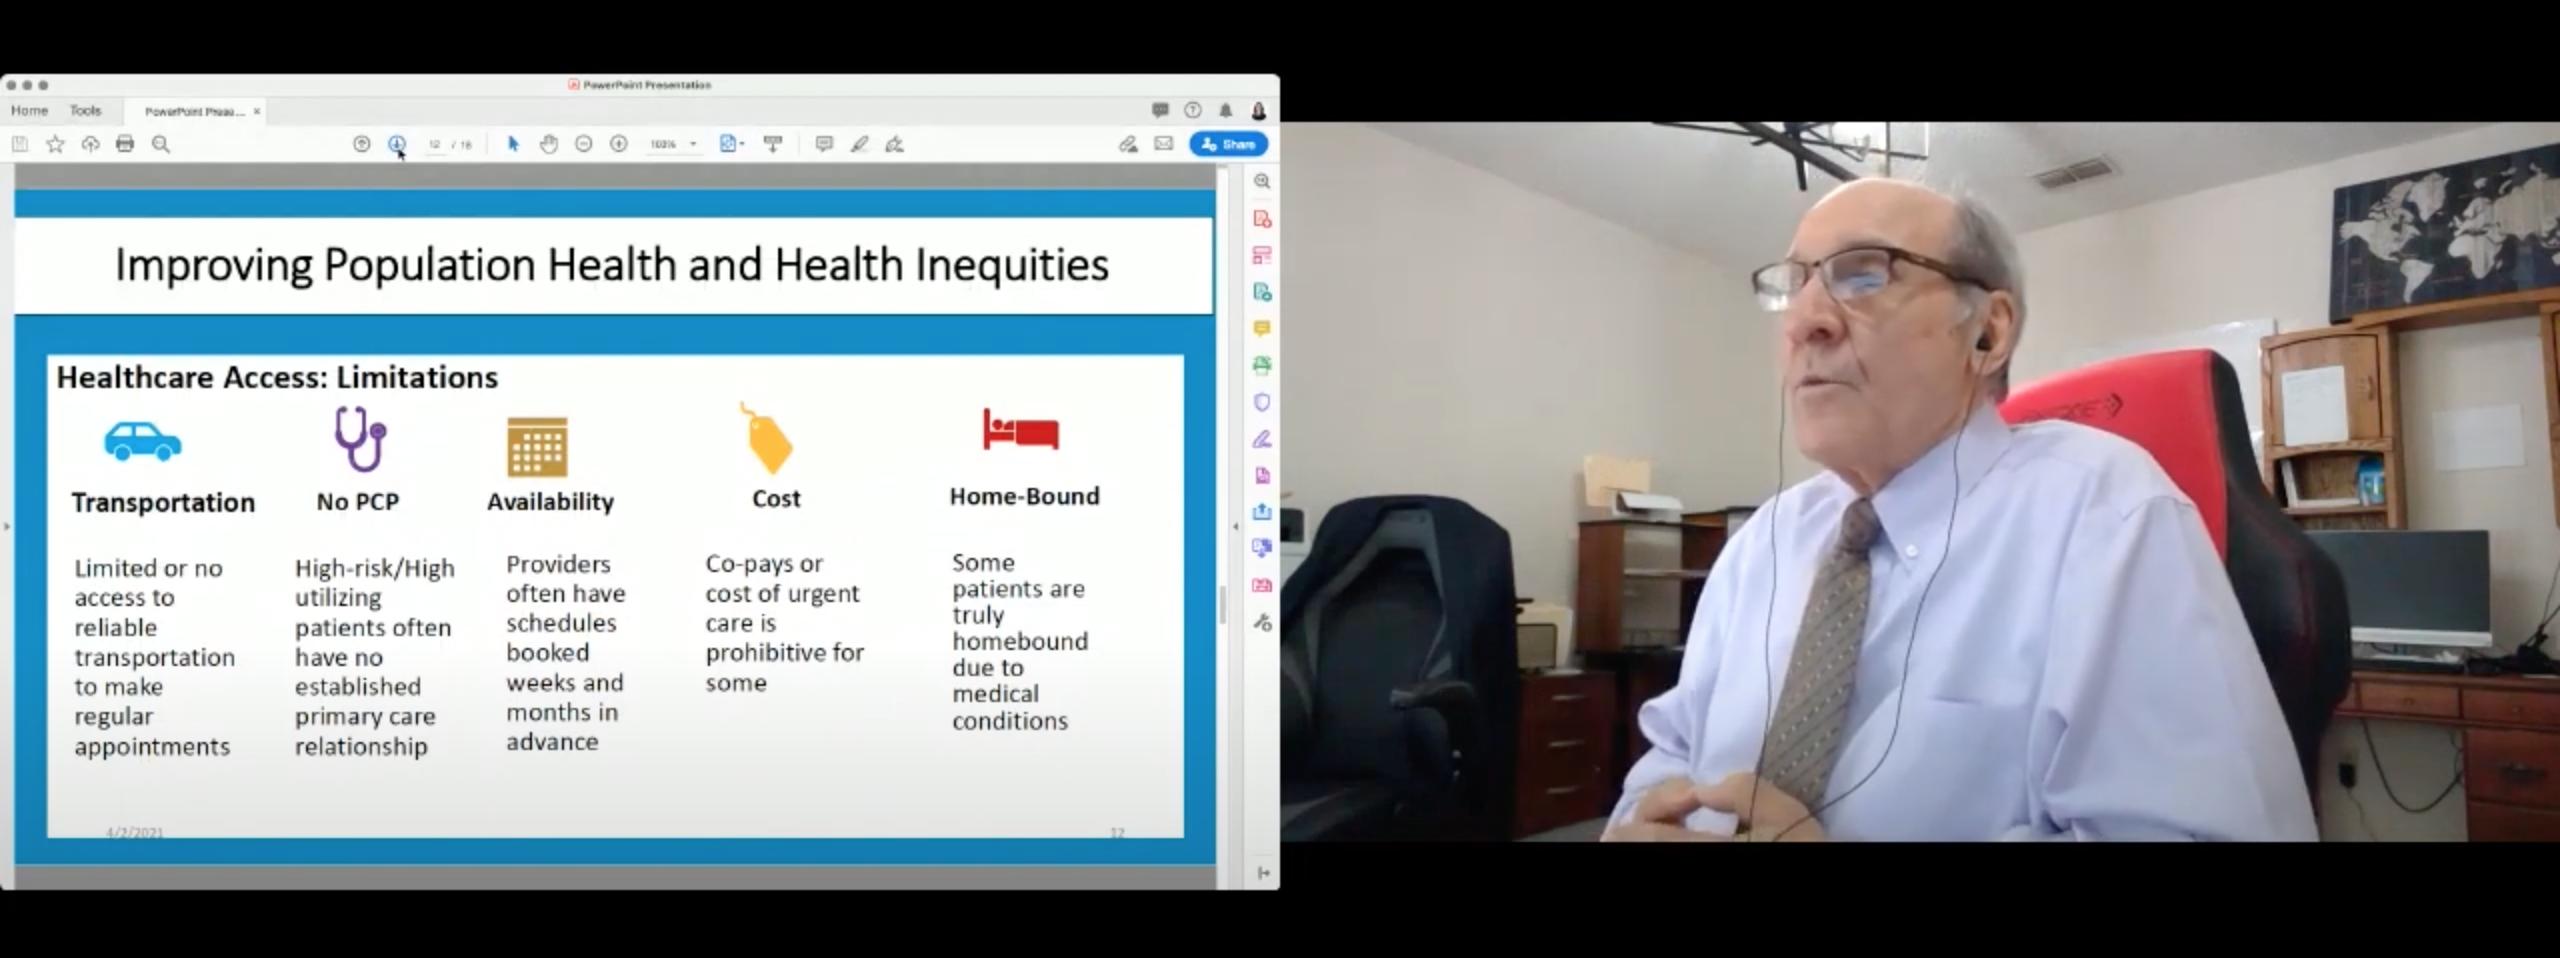 captura de pantalla de la conferencia